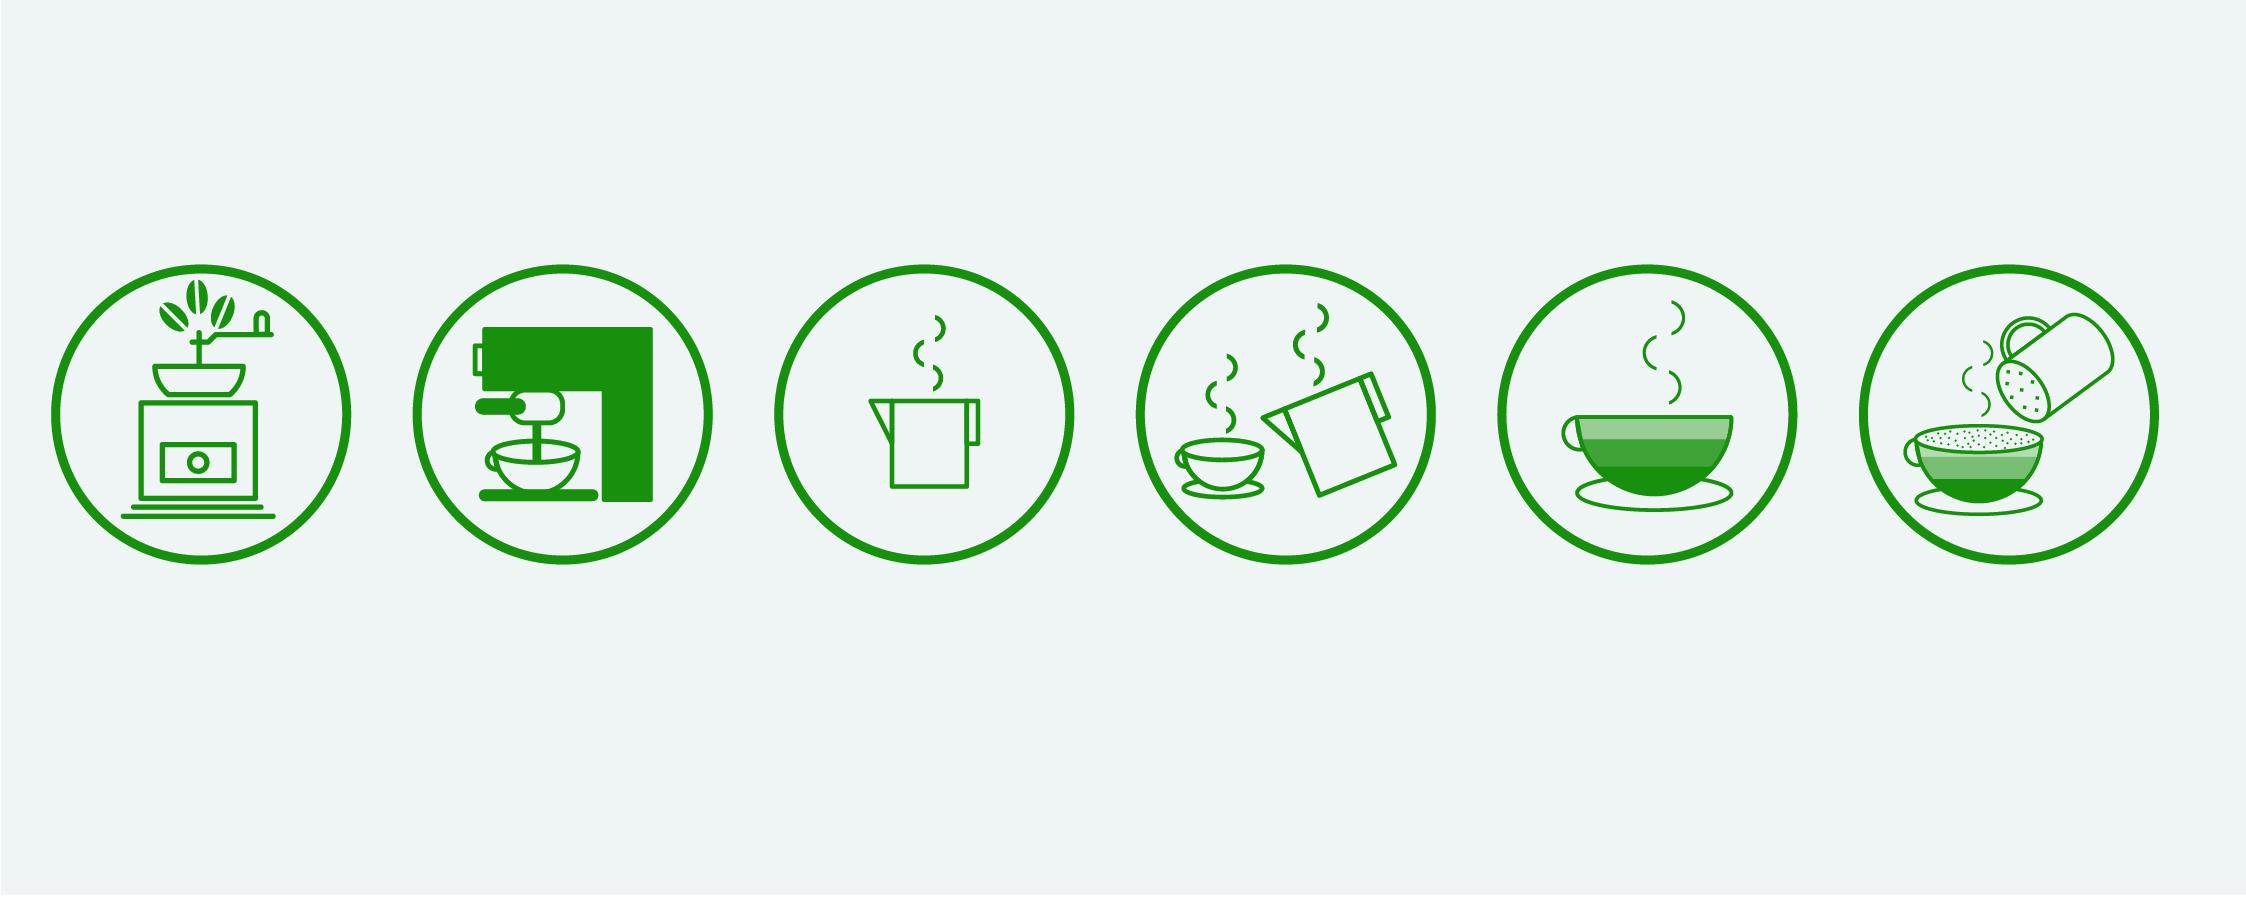 coffee icons-02.jpg